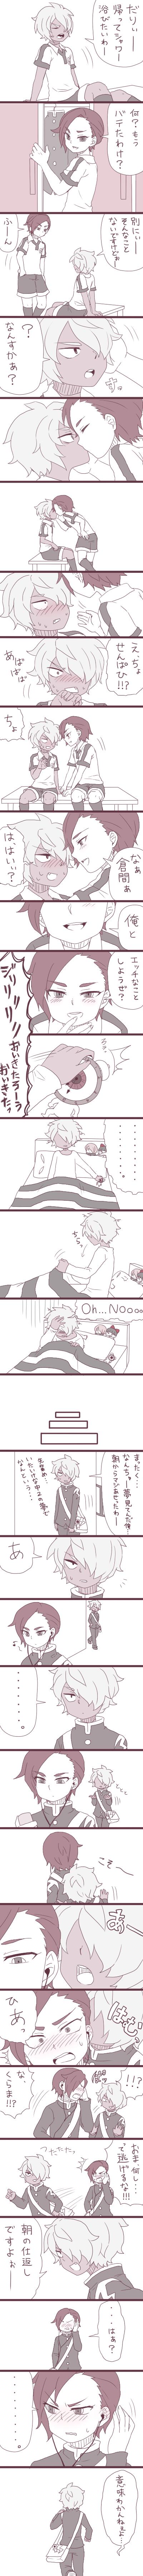 Tags: Anime, Pixiv Id 647094, Level-5, Inazuma Eleven, Inazuma Eleven GO, Kurama Norihito, Minamisawa Atsushi, Surprise Kiss, Locker, Locker Room, Clothes Hanger, Dreaming, Comic